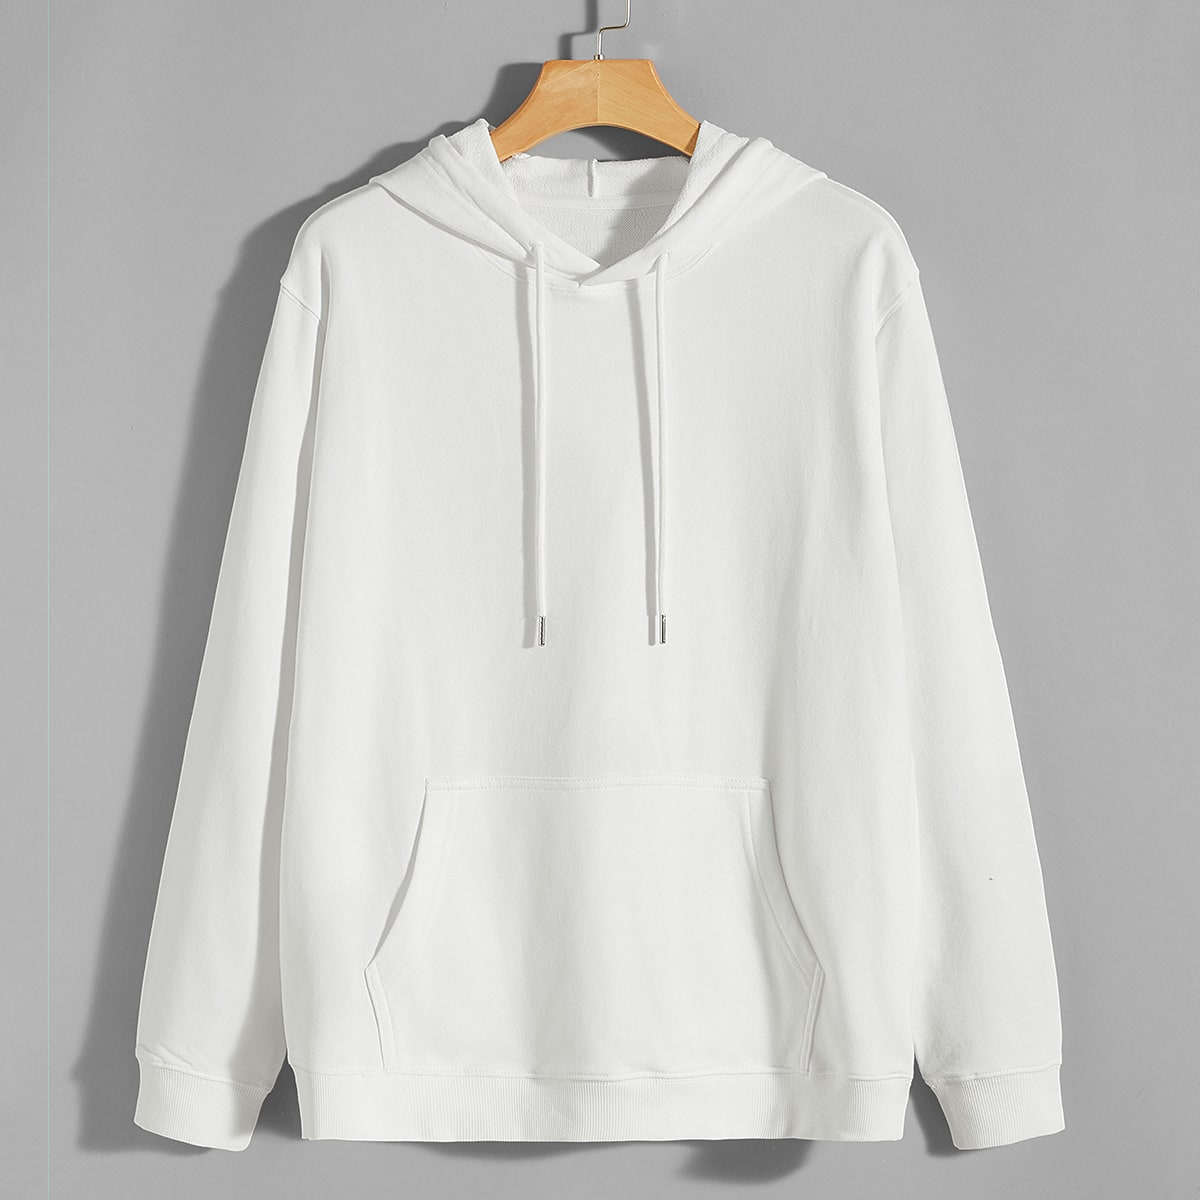 Men Solid Kangaroo Pocket Drawstring Hoodie, SHEIN  - buy with discount